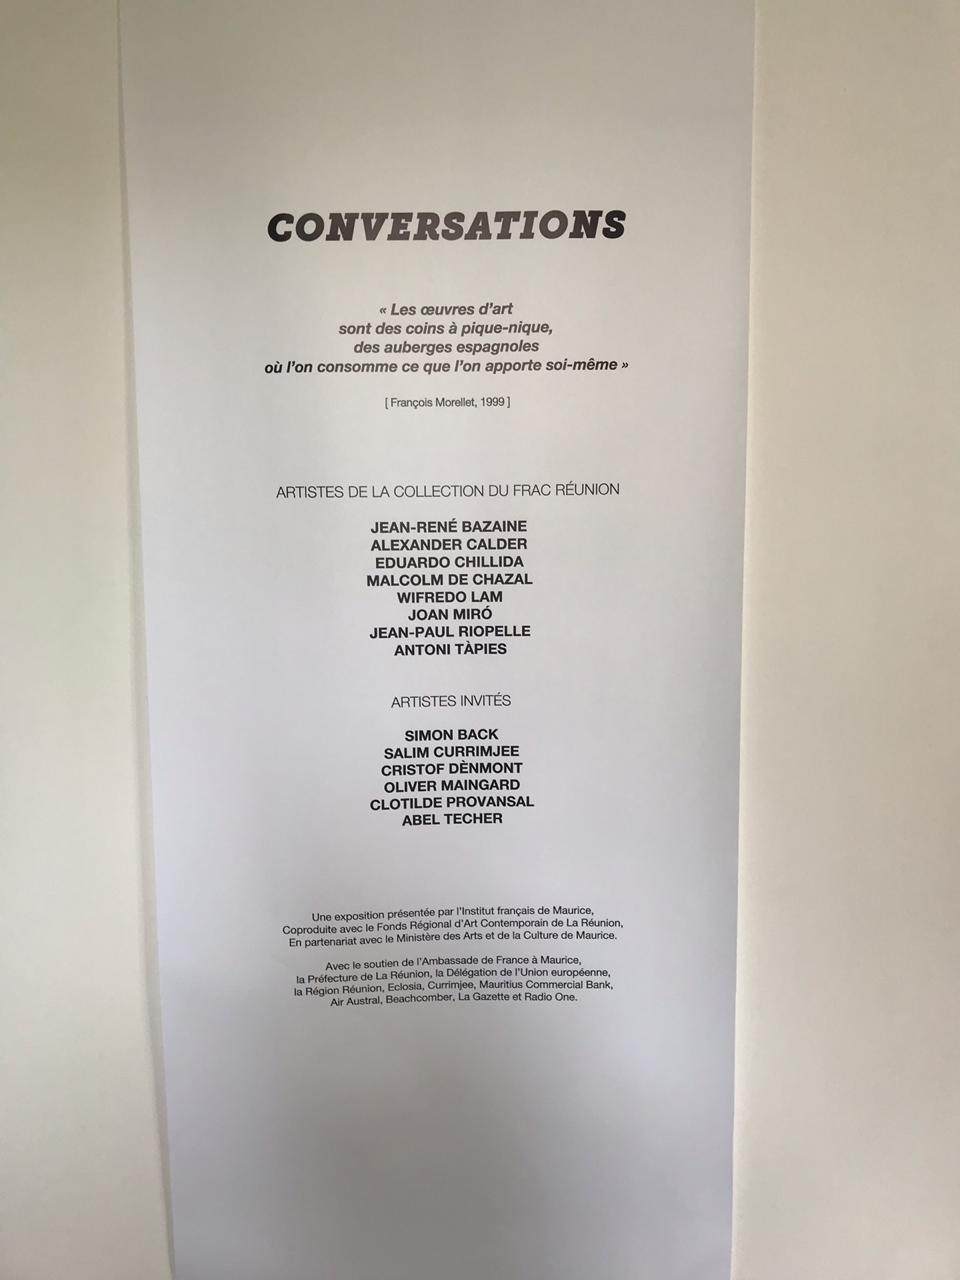 2019-10-EXPOSITION-CONVERSATIONS-CE2 (30)